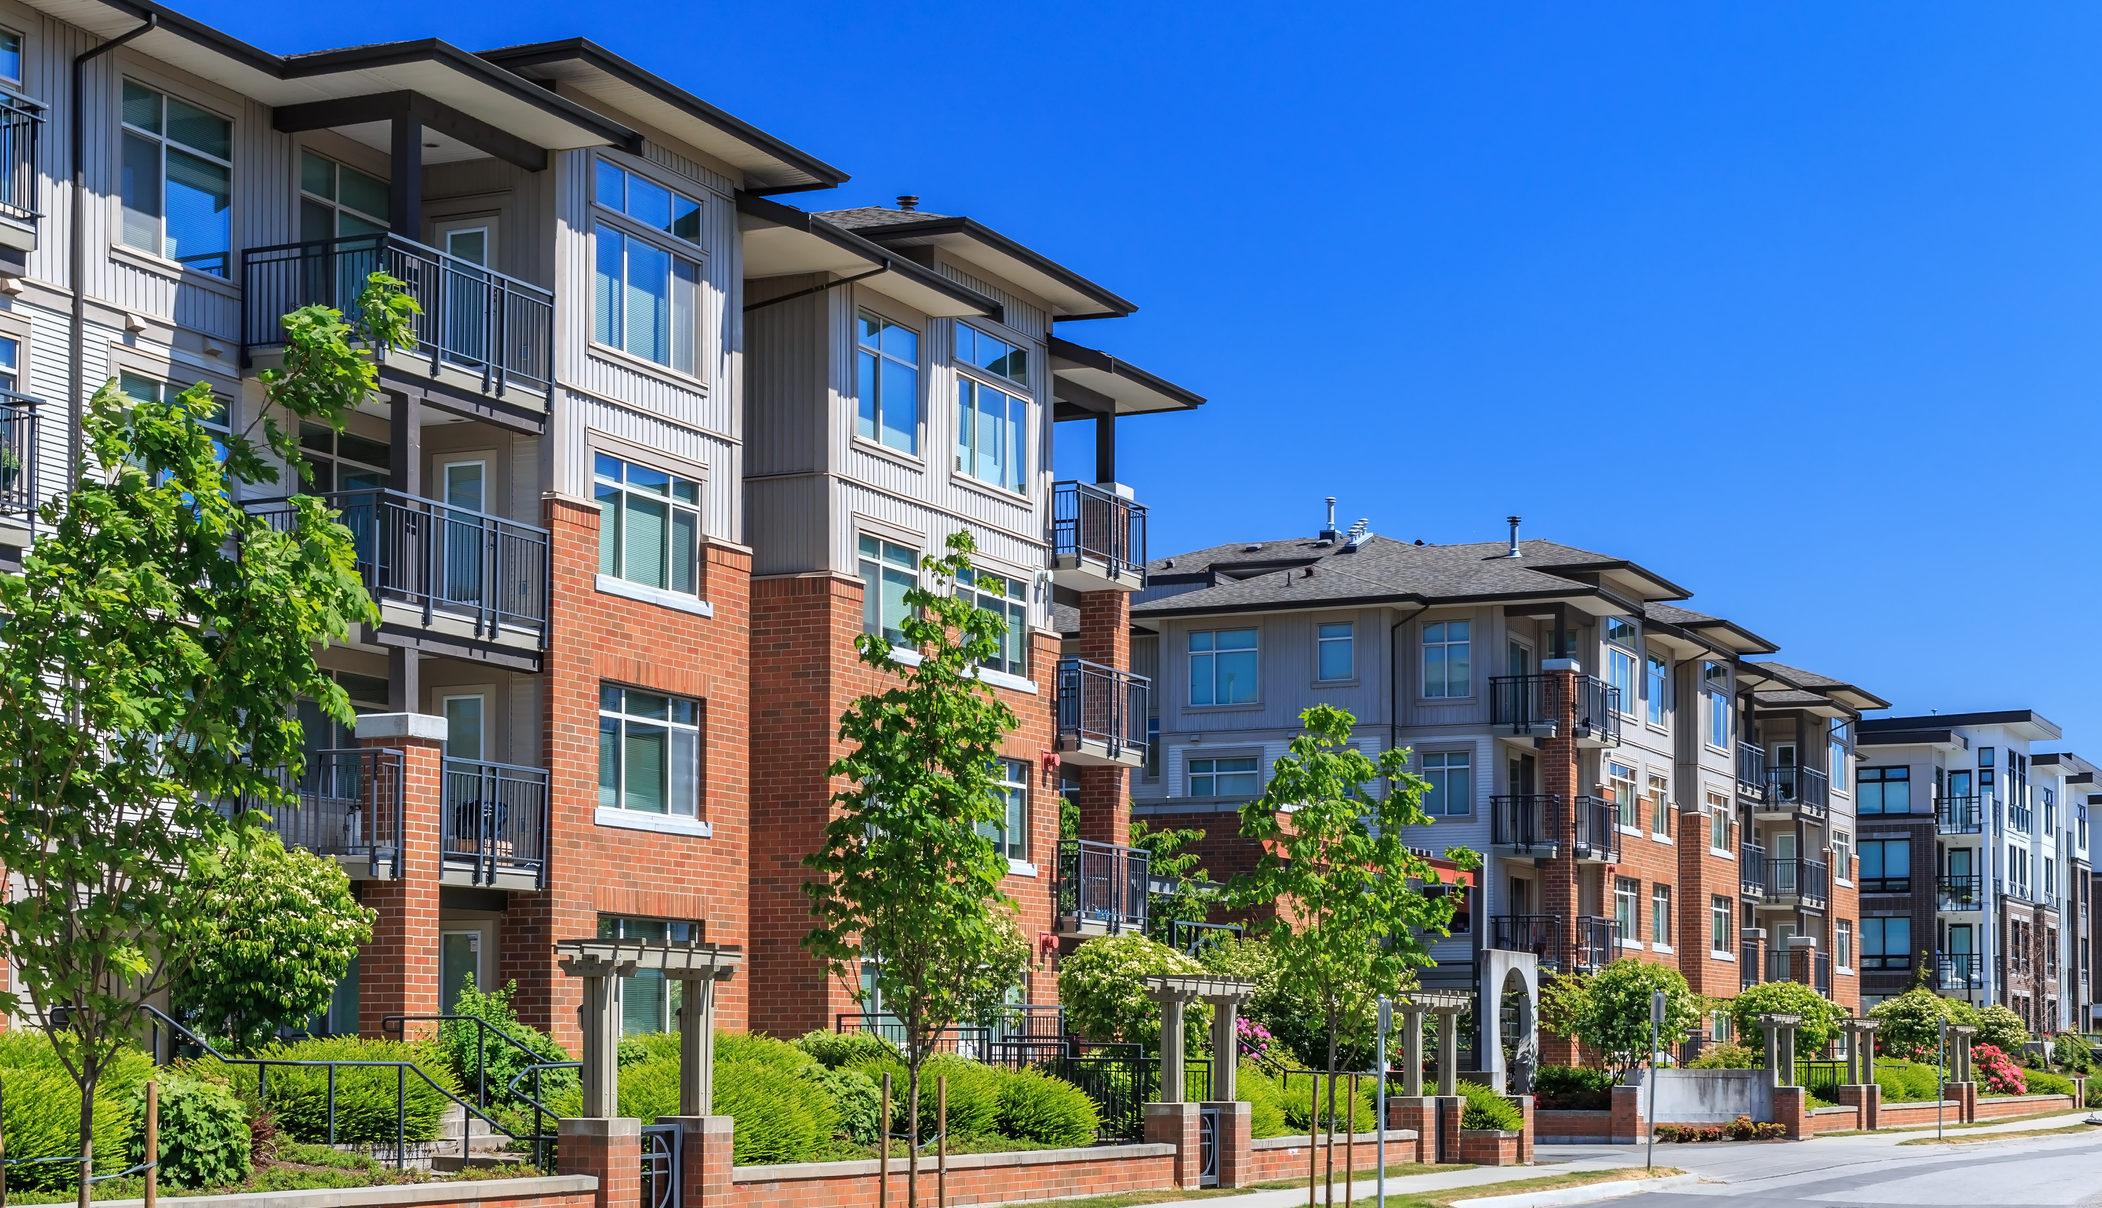 Commercial Real Estate Decatur